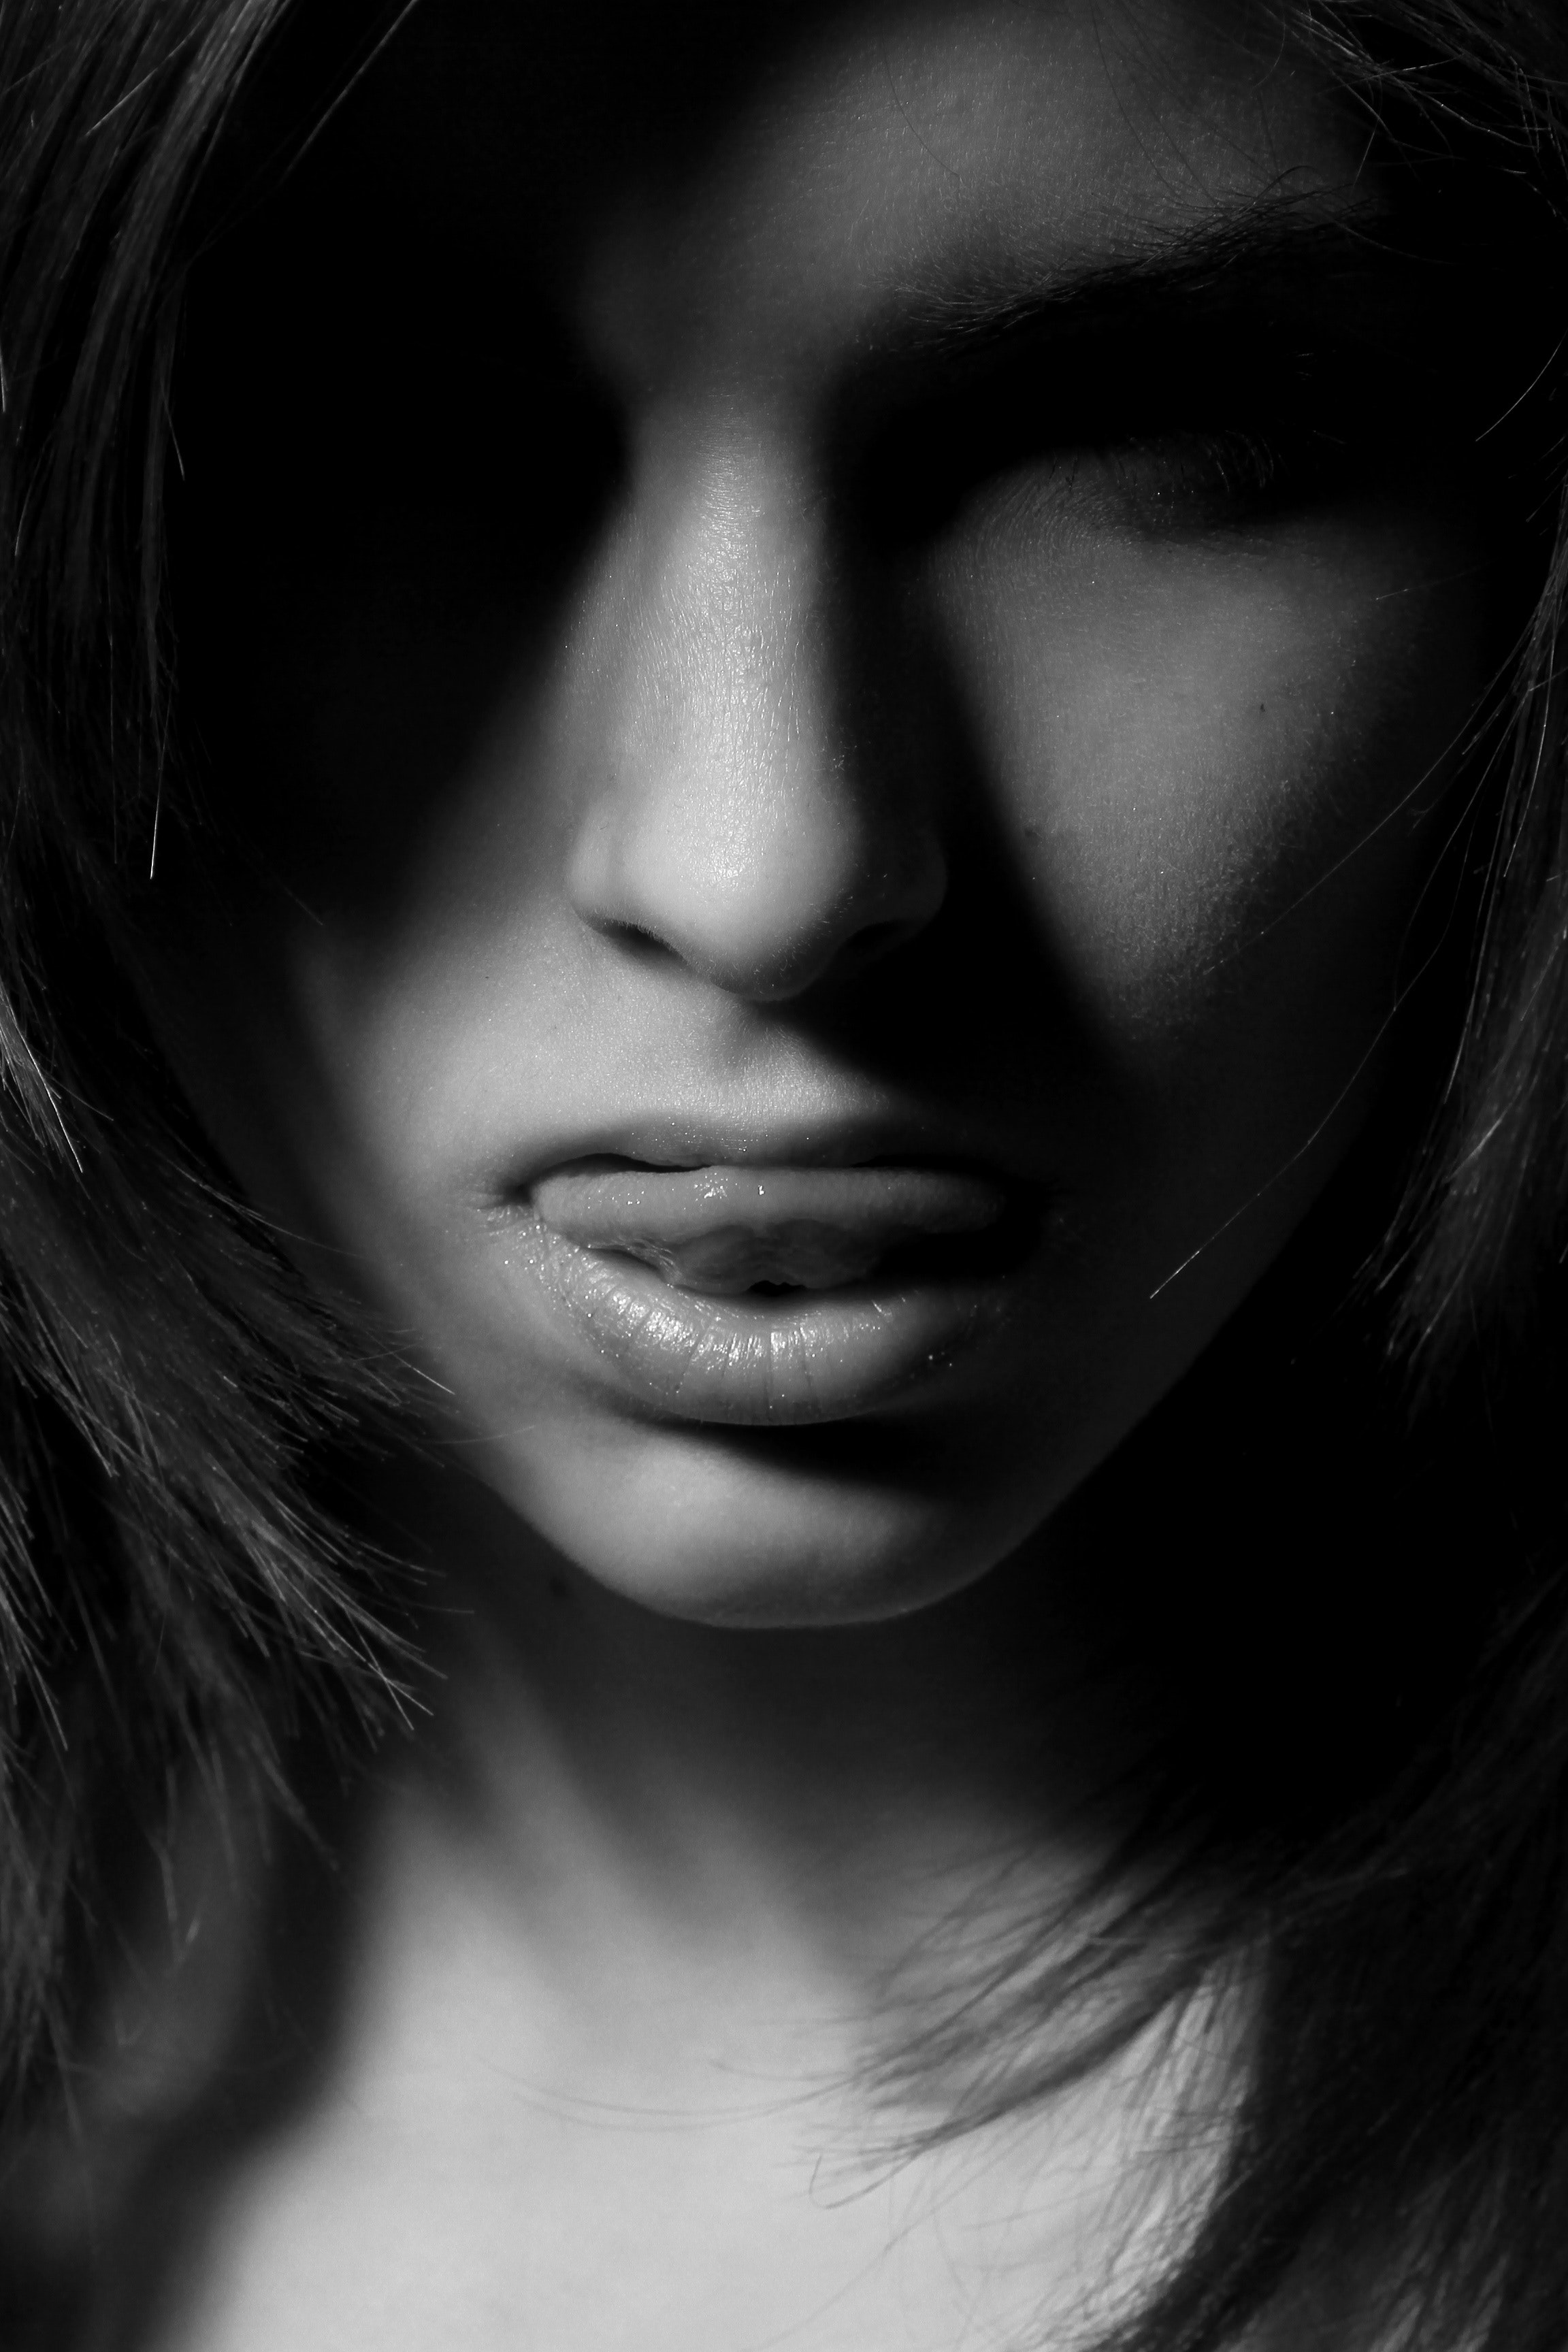 Similar photos womans face